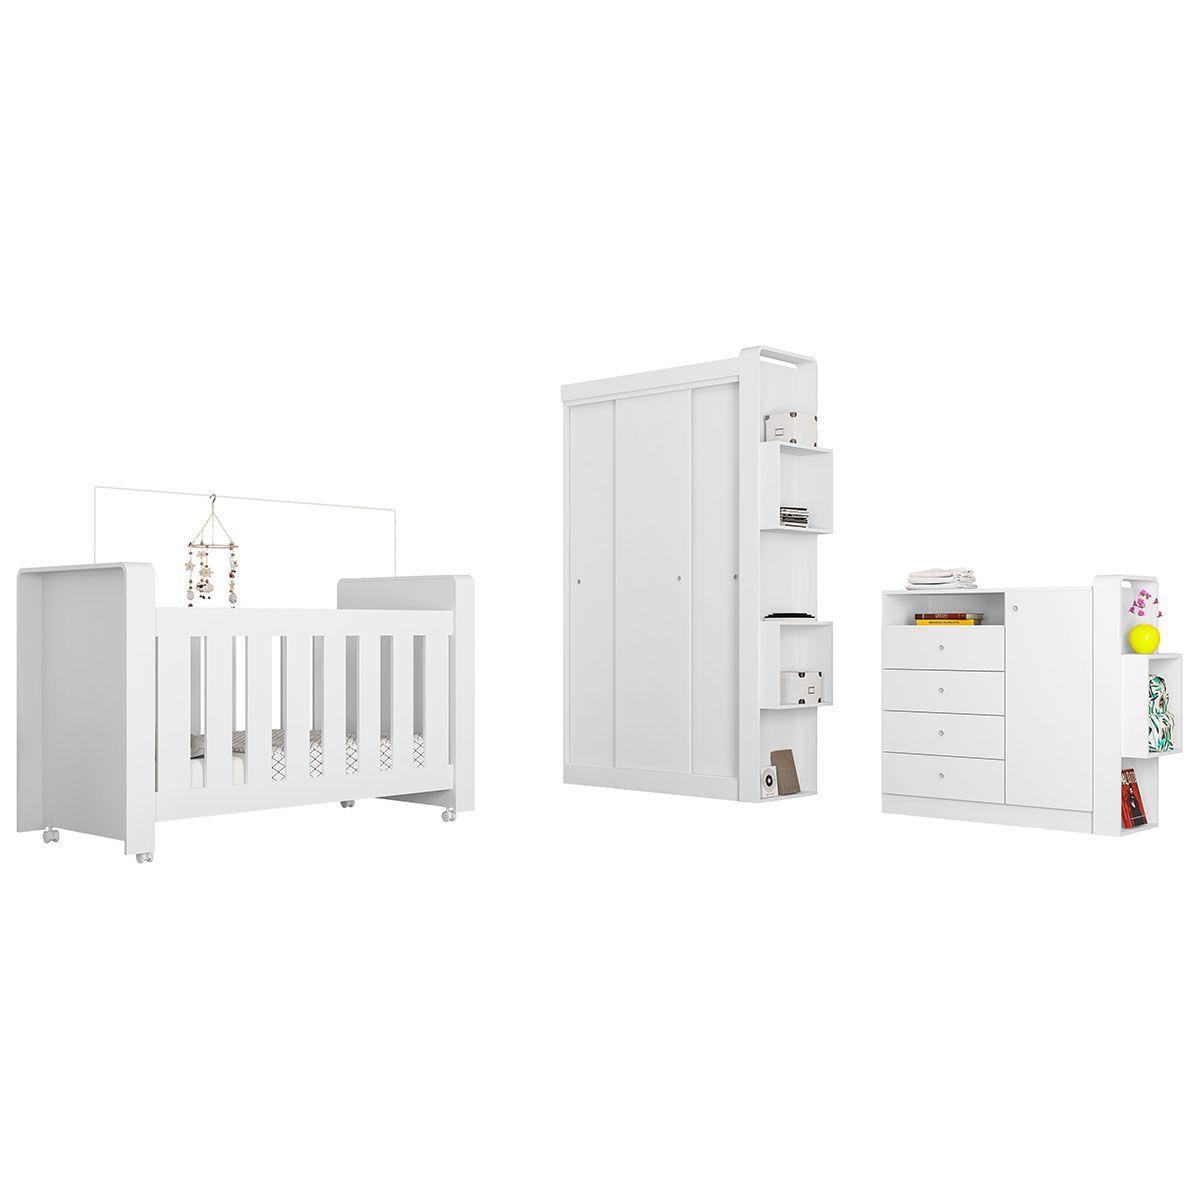 Quarto Infantil Completo Berço Cômoda Guarda Roupa 3 Portas de Correr 1 Kit de Rodízios Doce Cheiro Branco - Art In Móveis